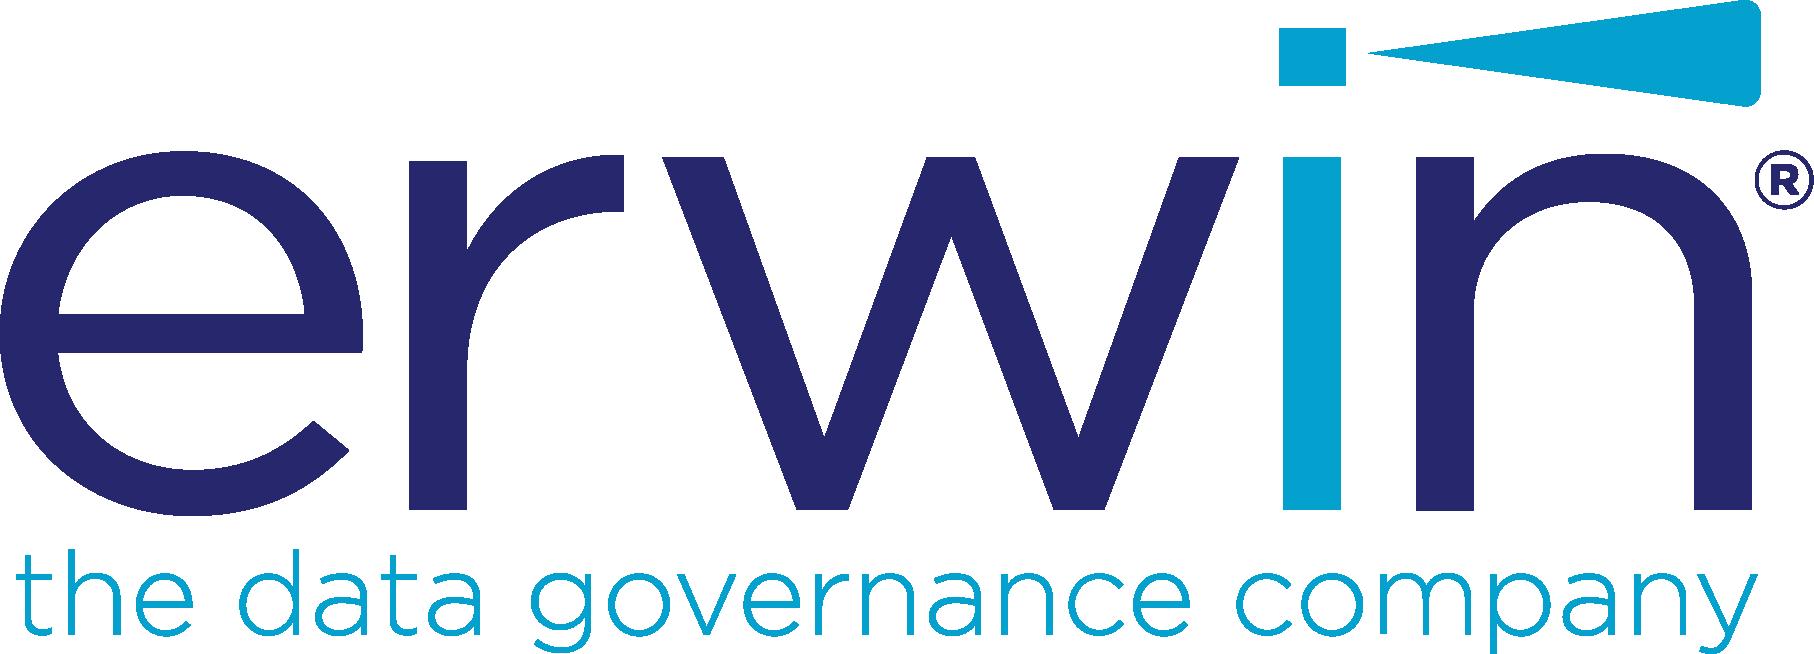 erwin-logo-tagline.png